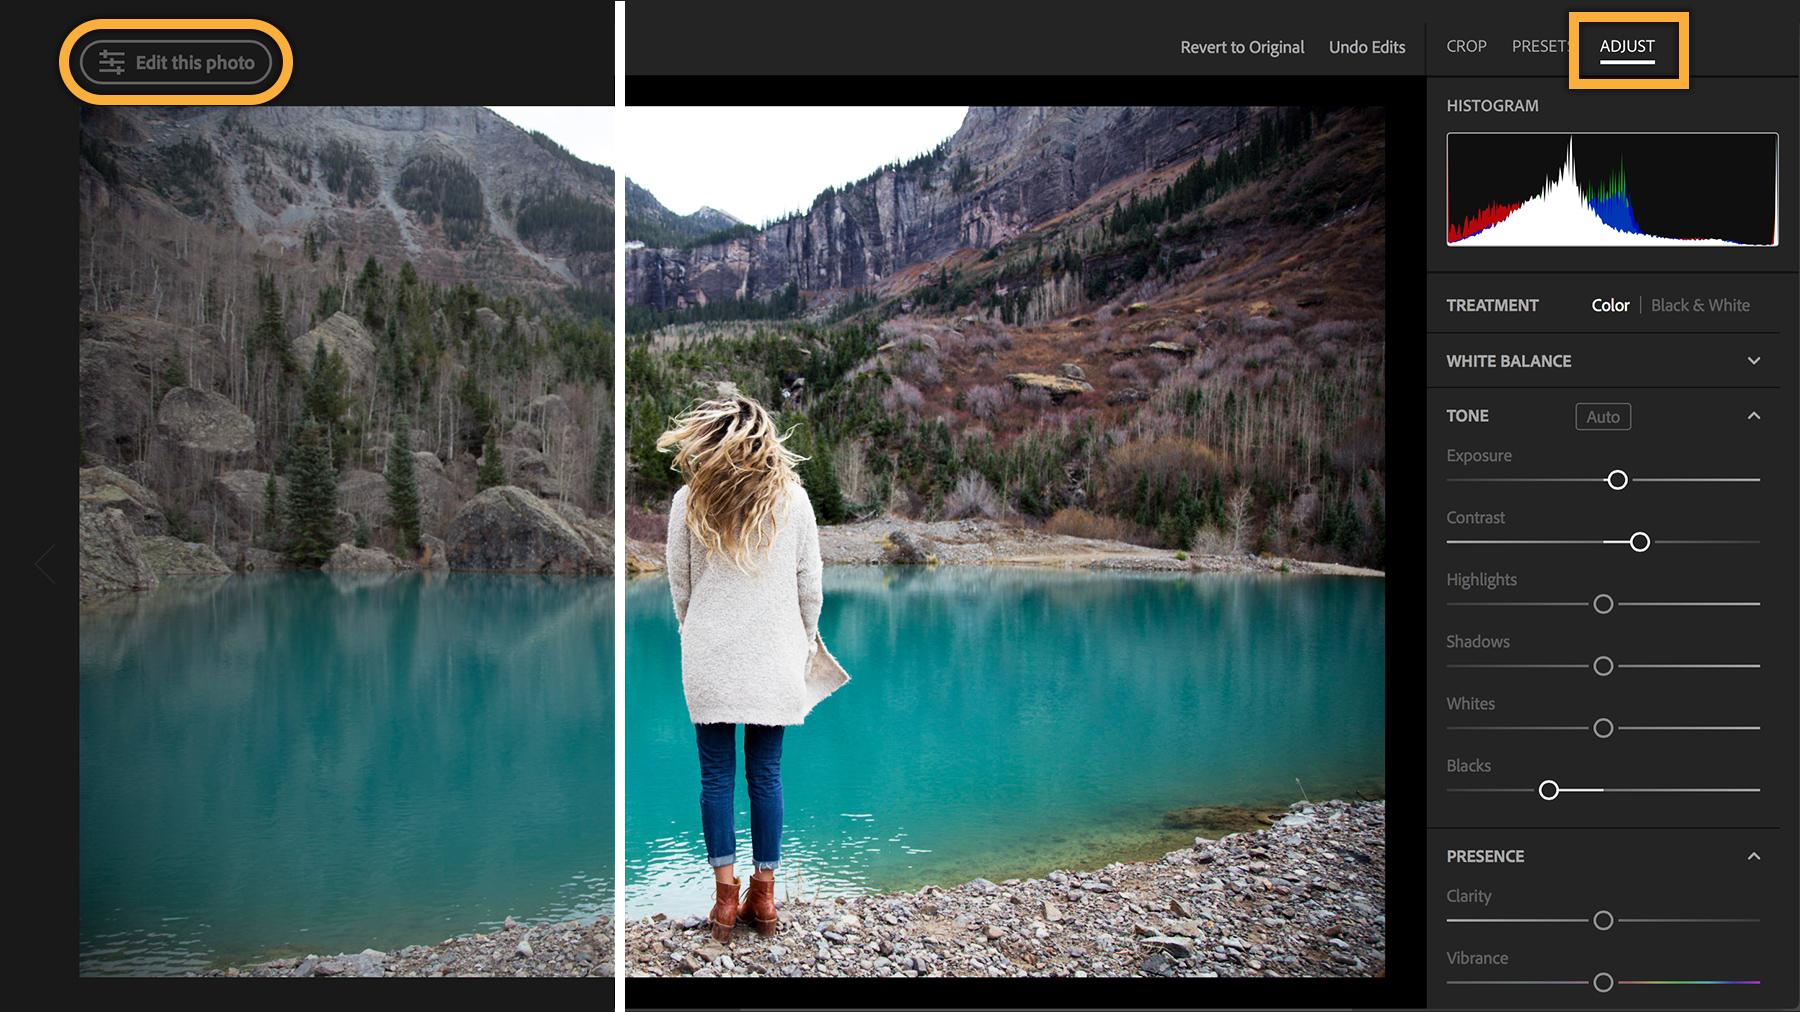 edit lightroom adobe editing tinder photoshop helpx organize cc hack exposure apps help profile